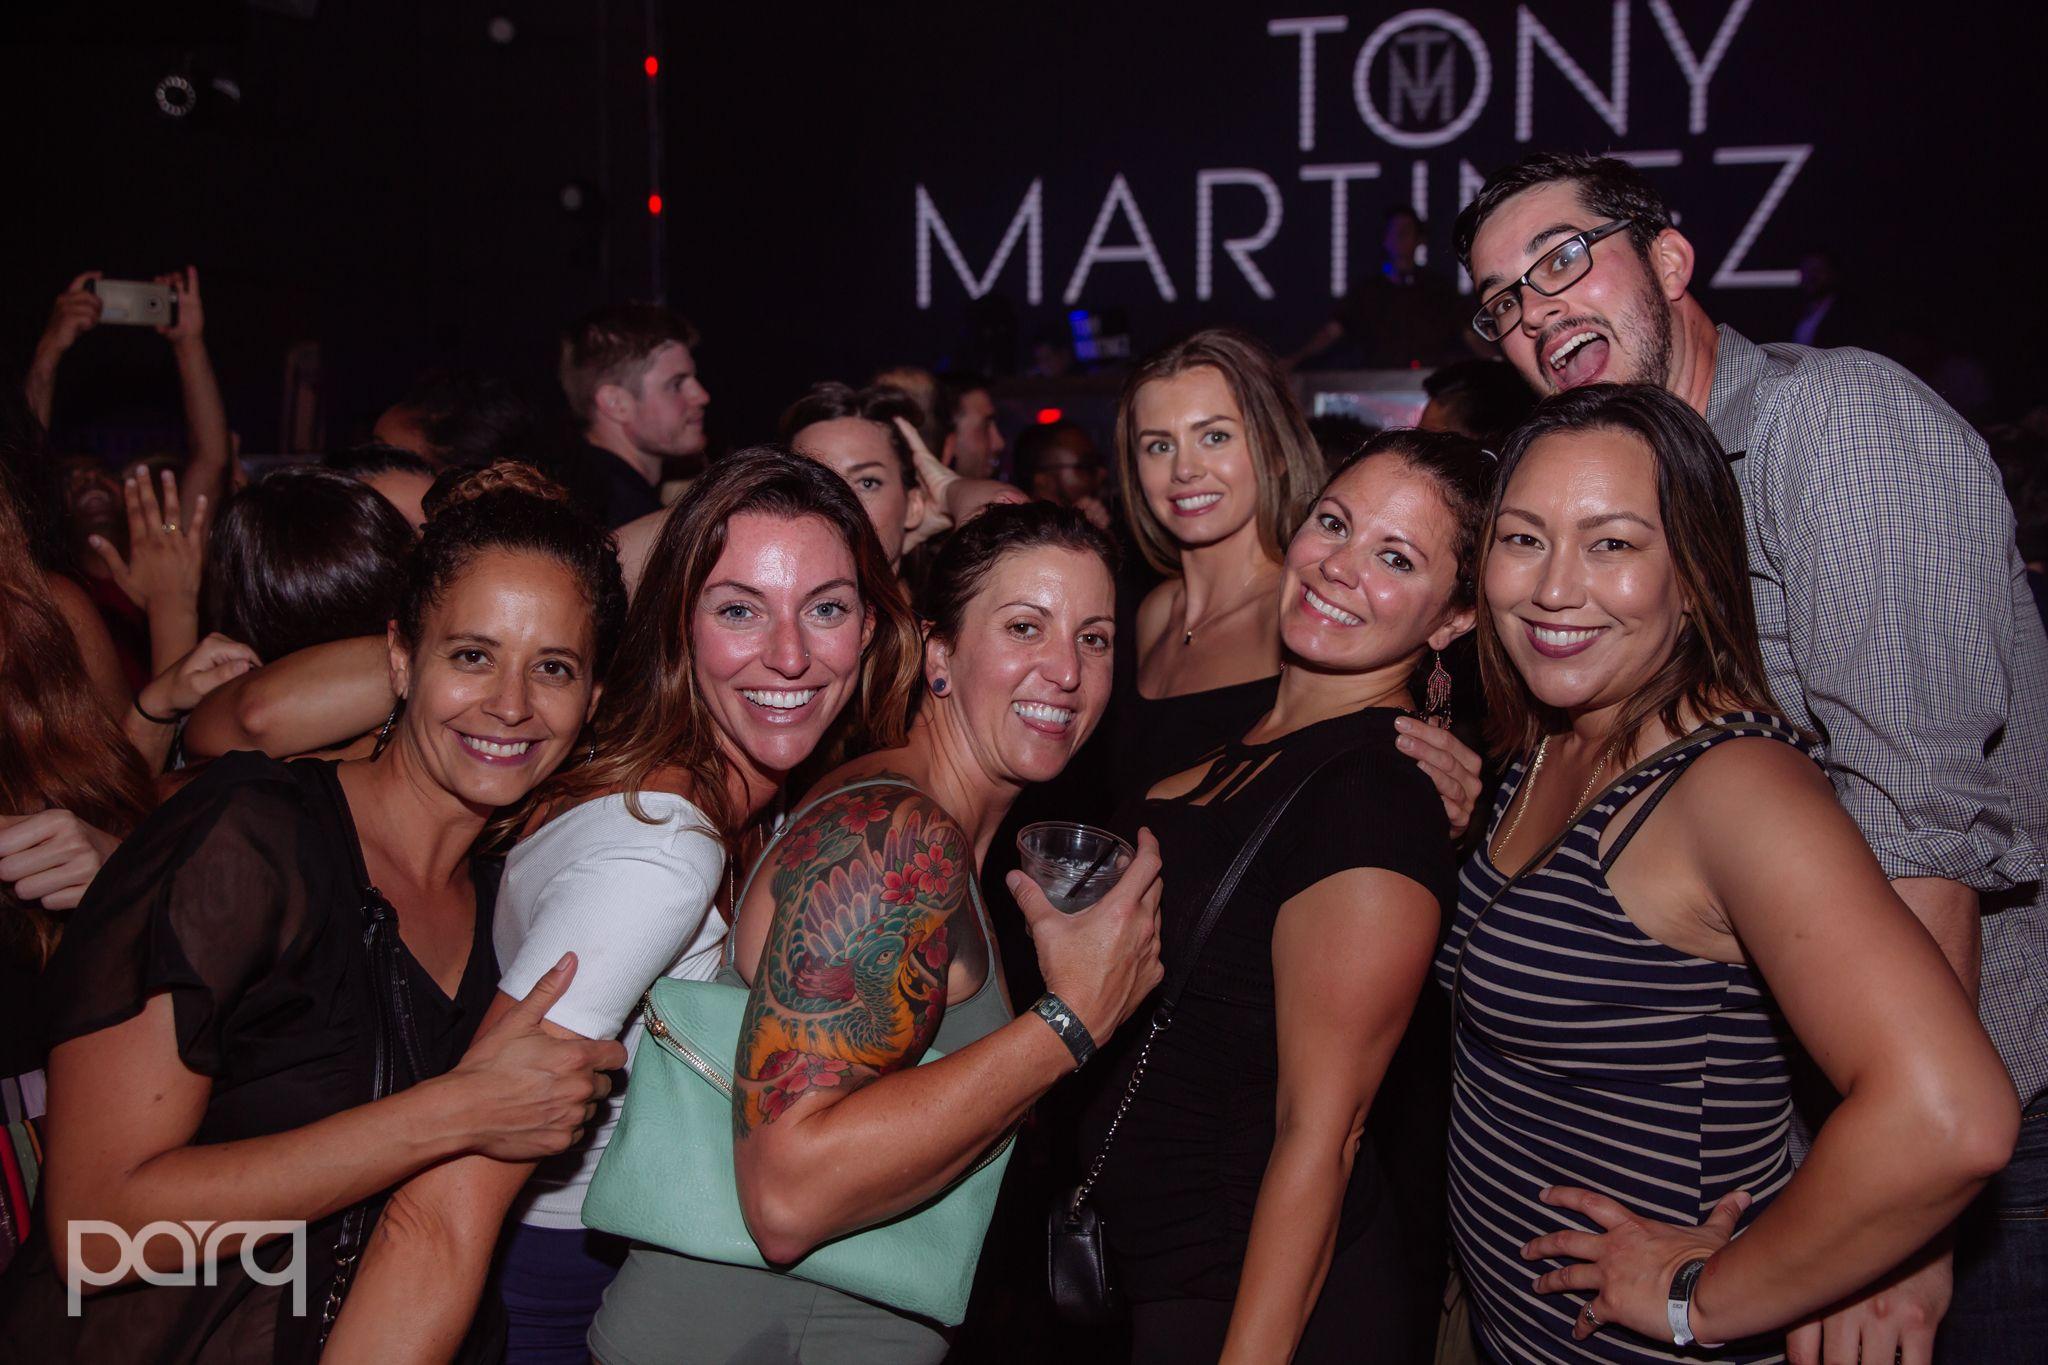 09.14.18 Parq - Tony Martinez-8.jpg